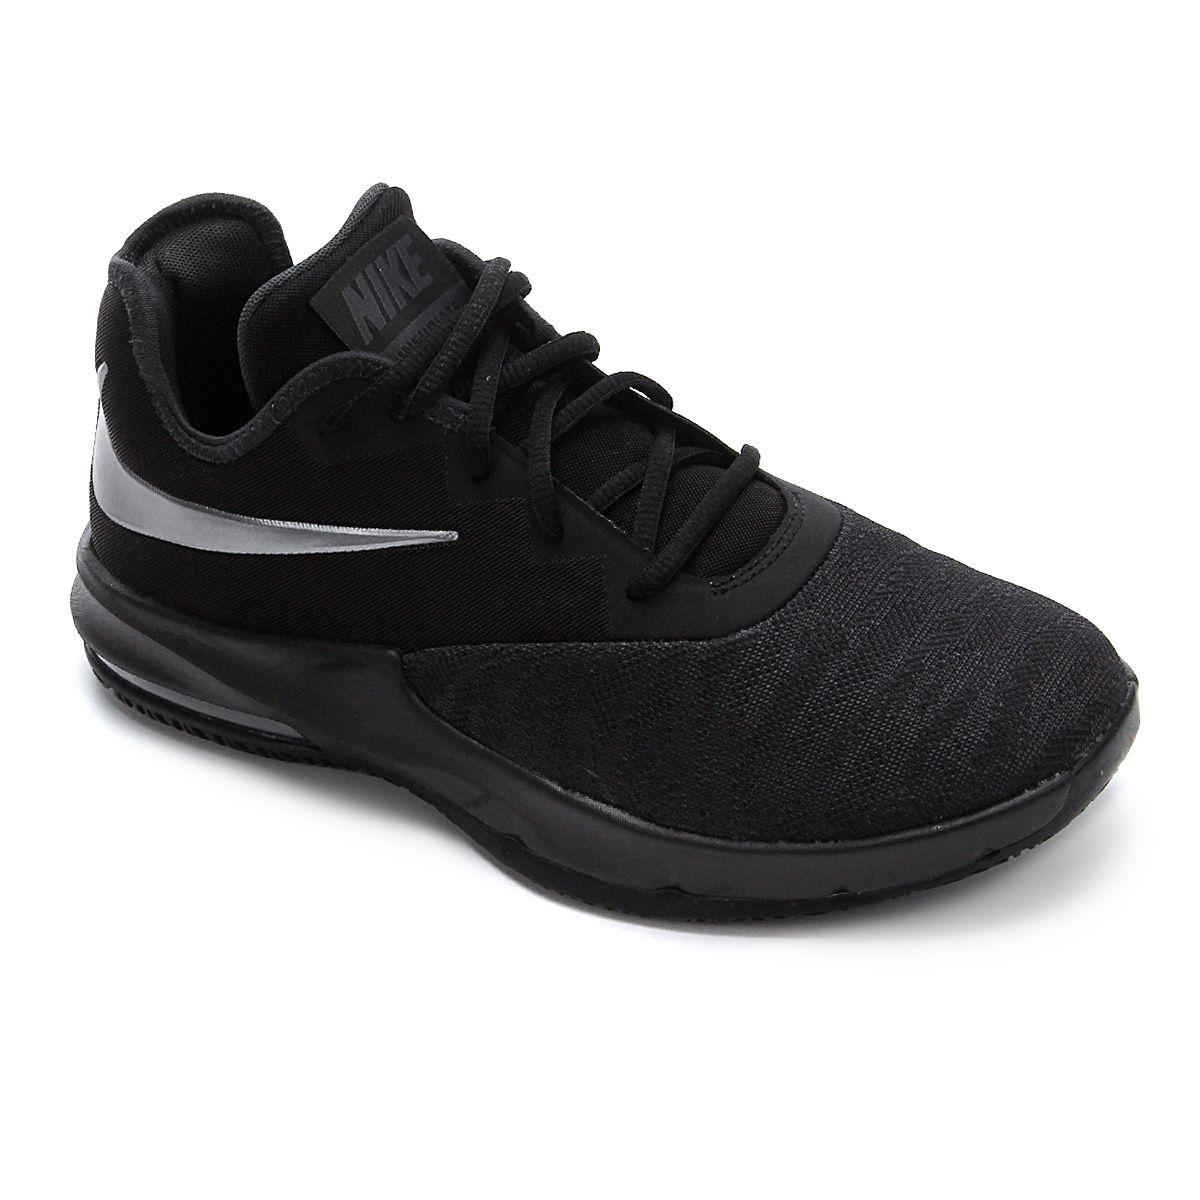 Tenis Nike Air Max Infuriate Iii Low - Aj5898-007